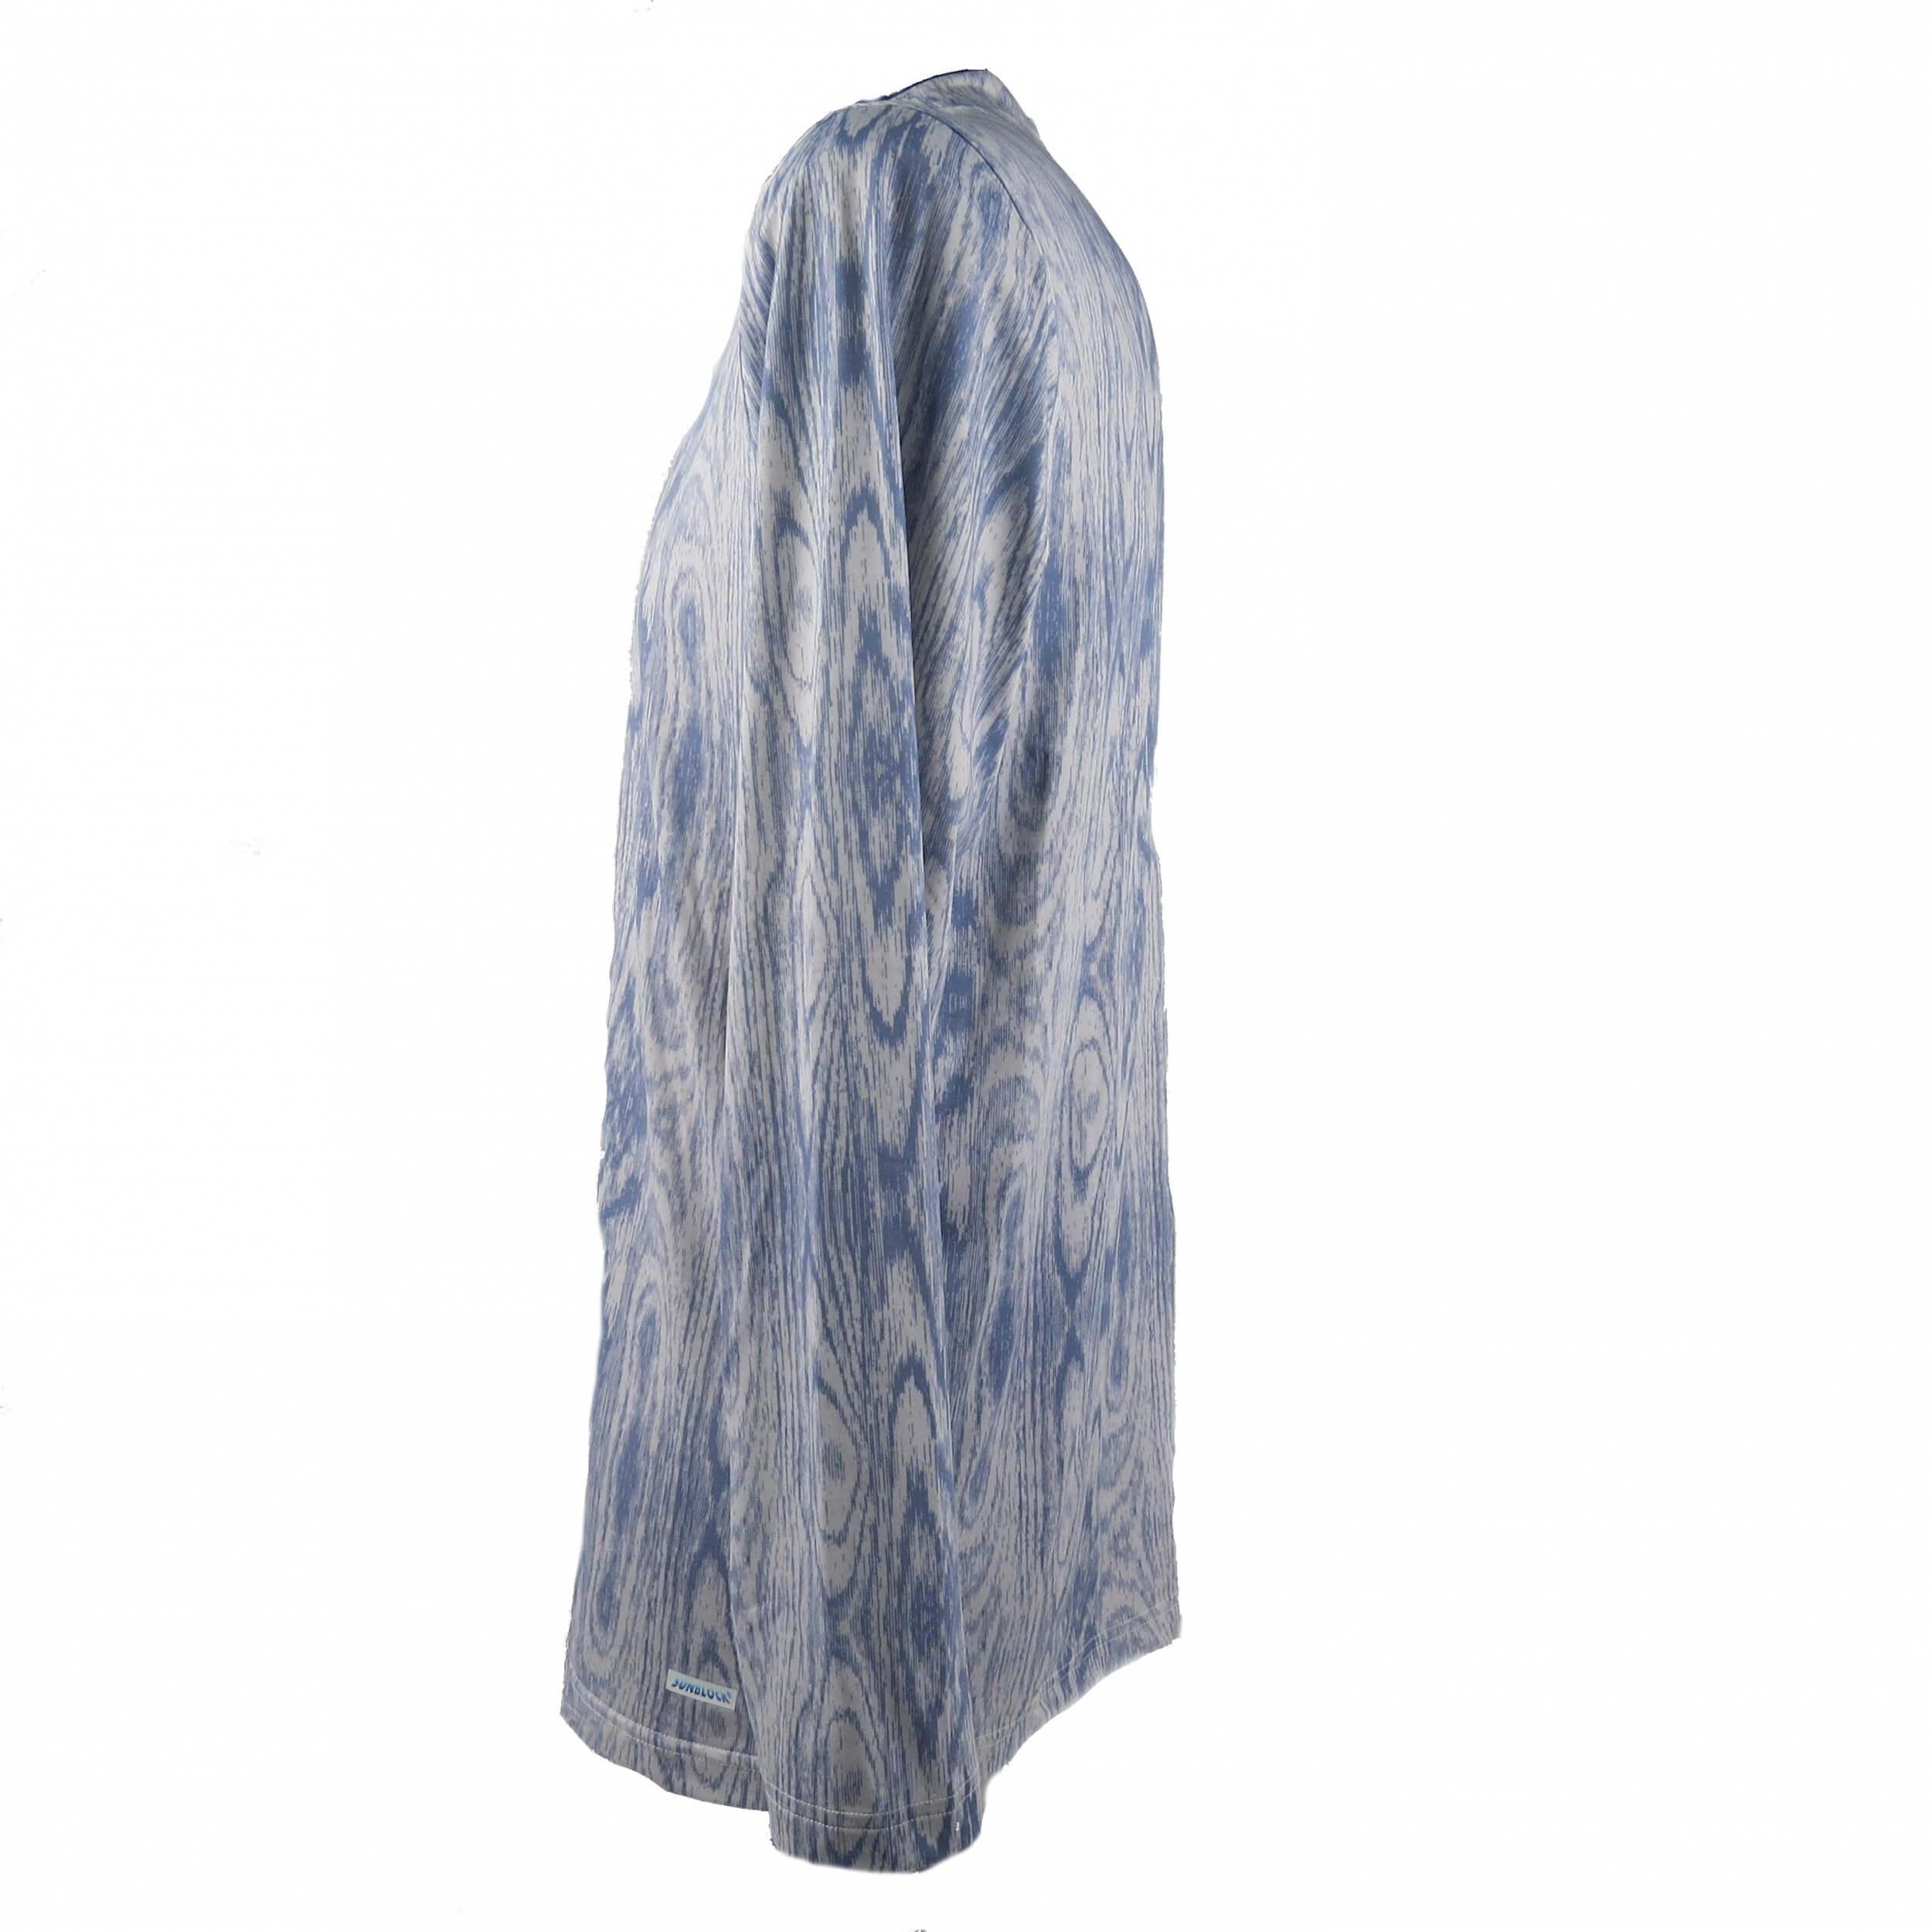 Chervo Herren Langarm Funktionsshirt Sunblock  Tabasco blau/weiß 22A 2.Wahl